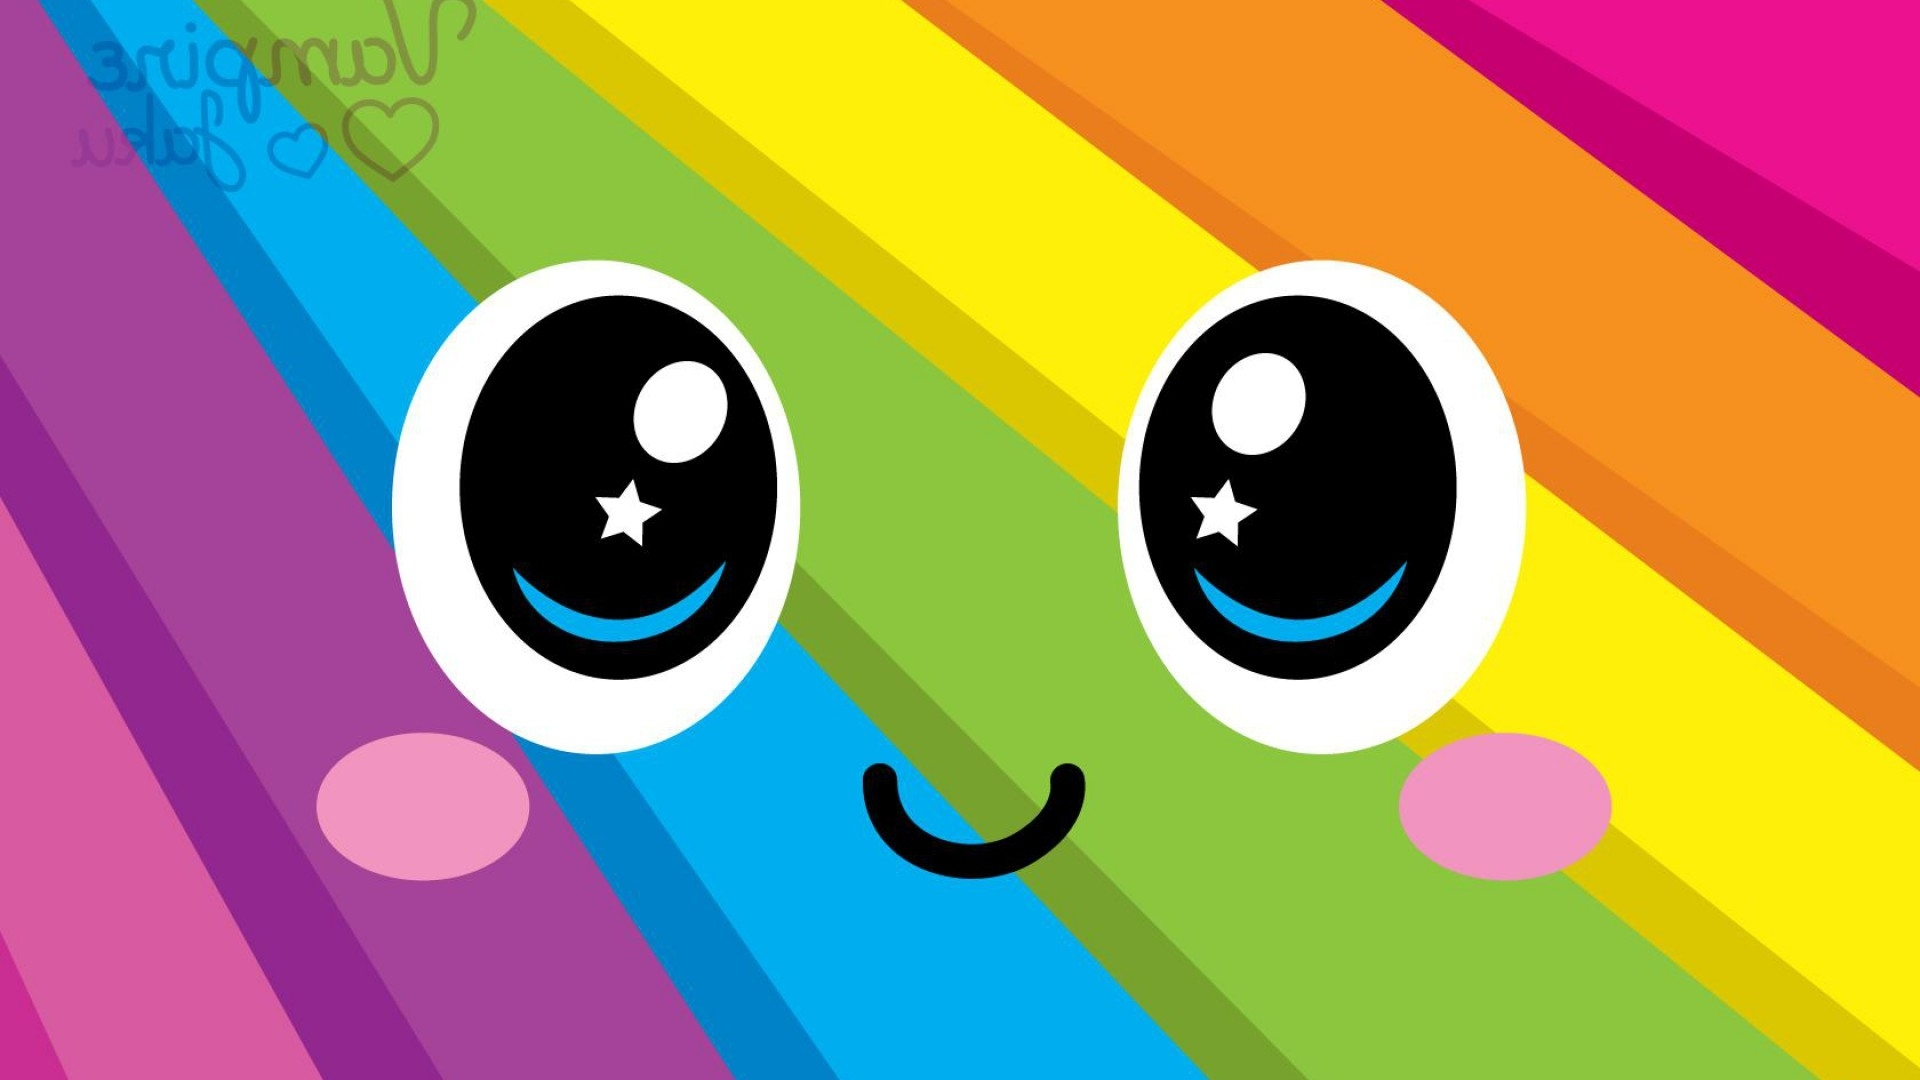 colorful smiley face hd desktop wallpaper, instagram photo